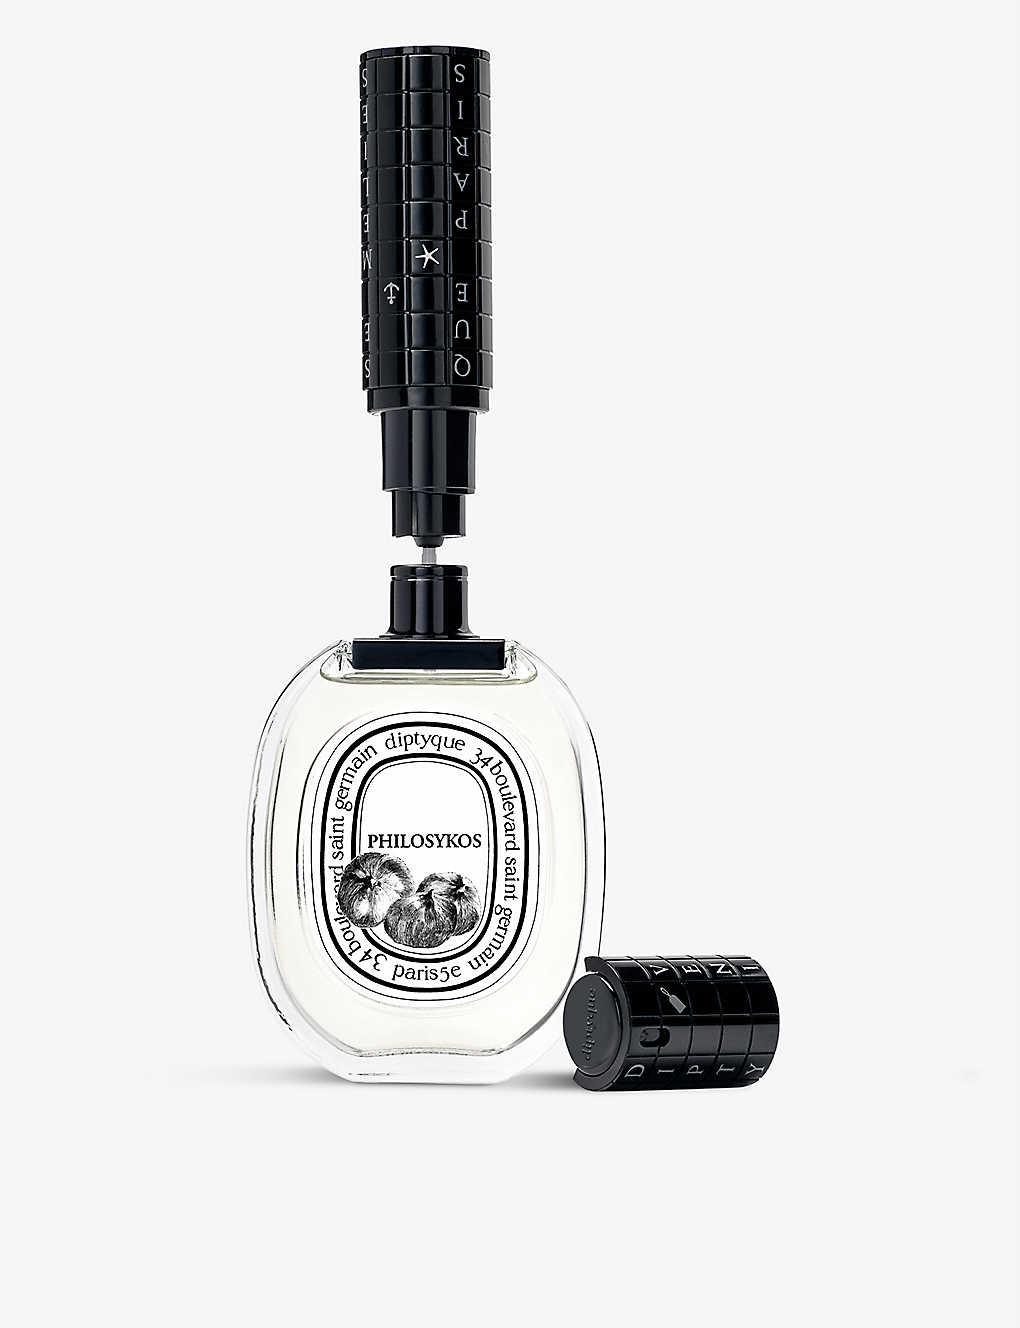 Philosykos eau de toilette travel spray 20ml